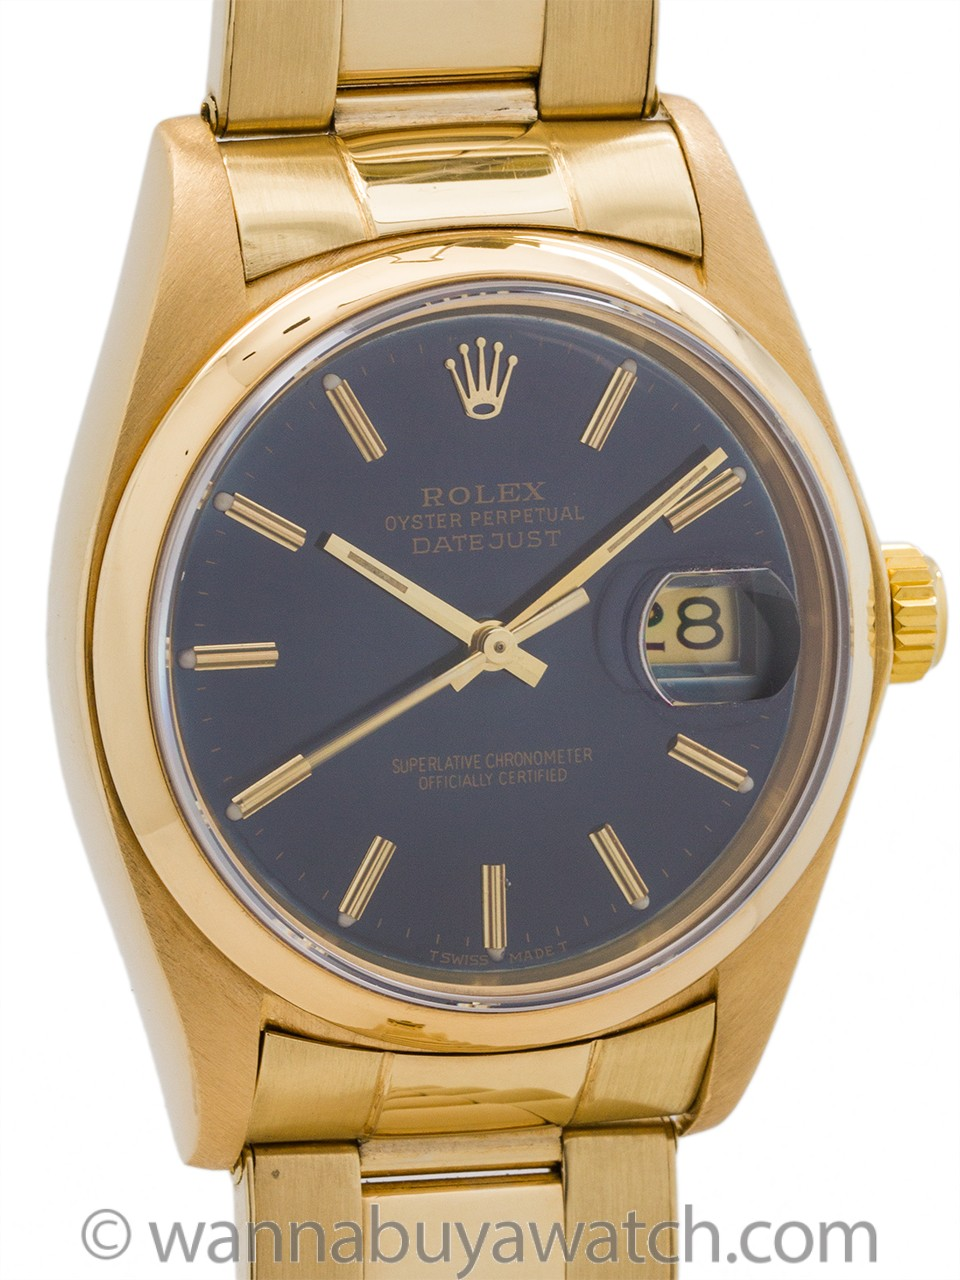 Rolex Datejust 18K ref 16018 Sapphire Blue Dial circa 1978